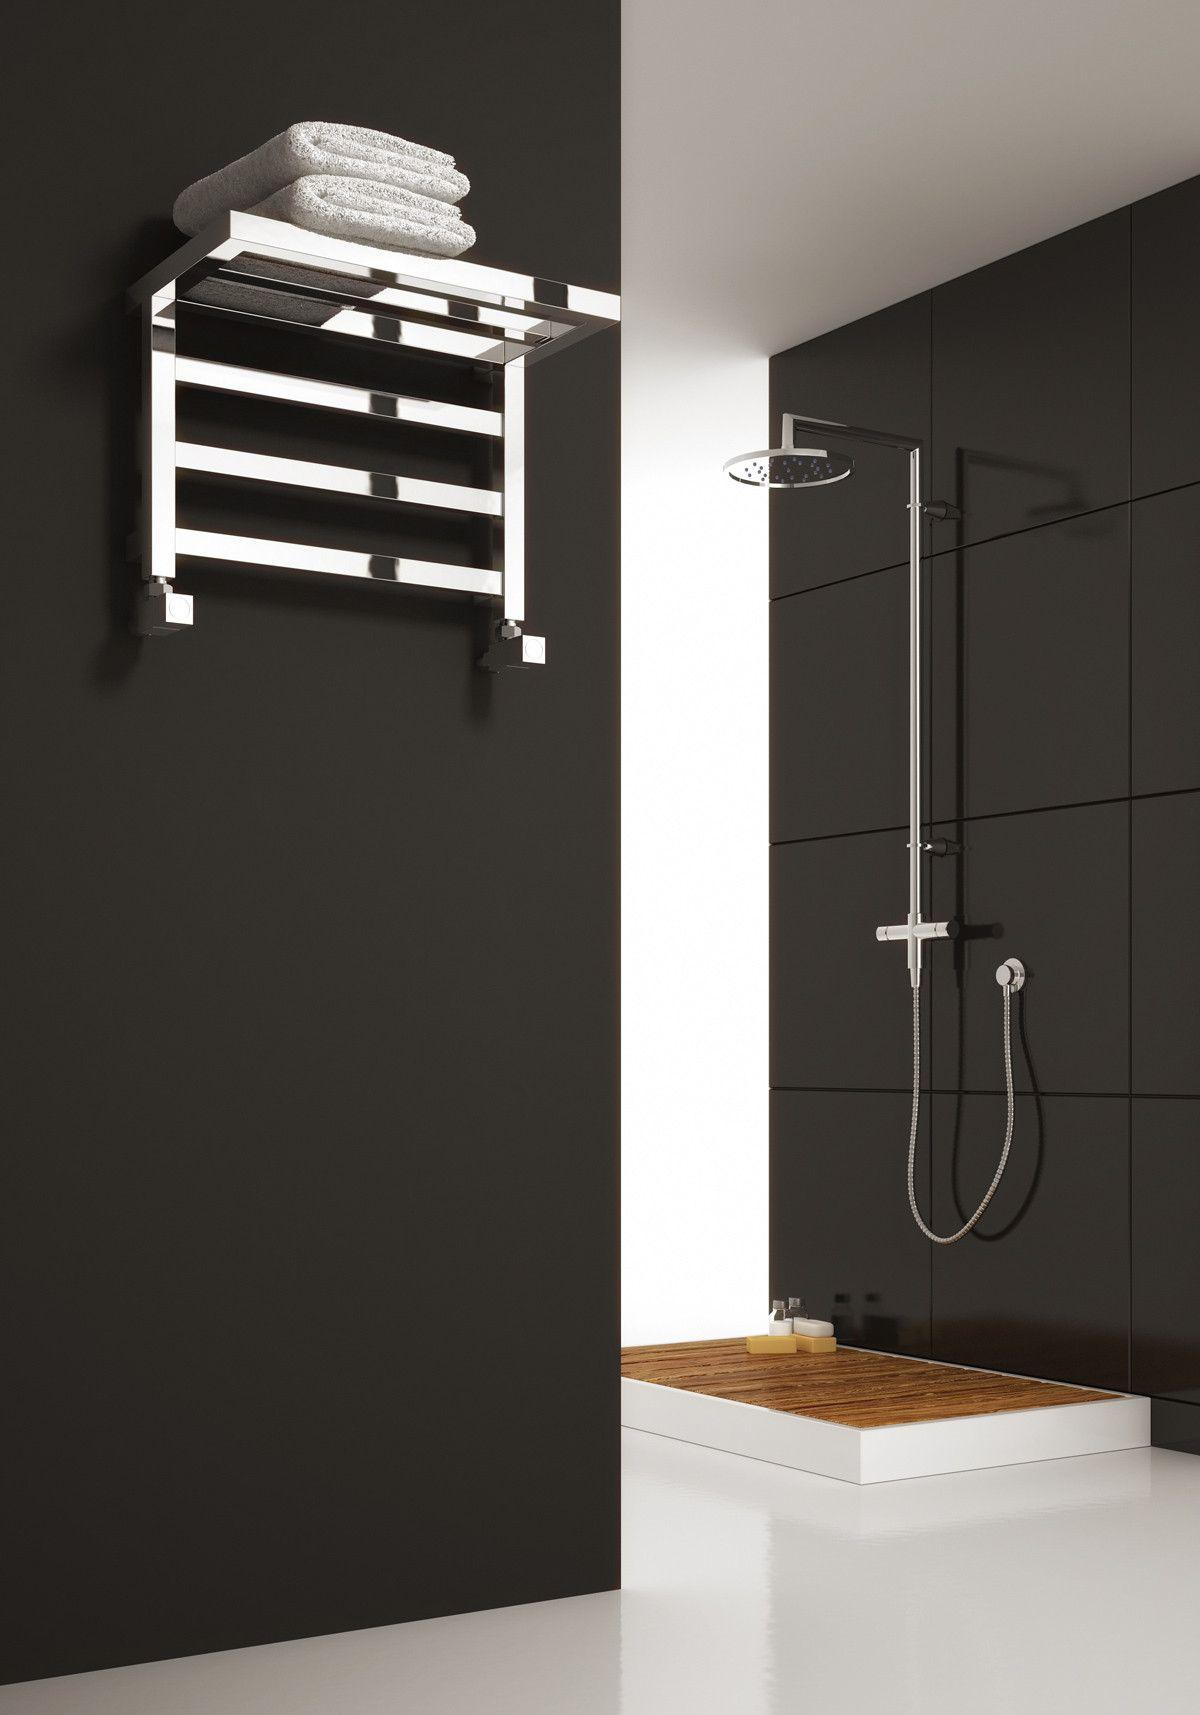 Reina Elvina Designer Towel Rail Bathroom Radiators Towel Radiator Towel Rail